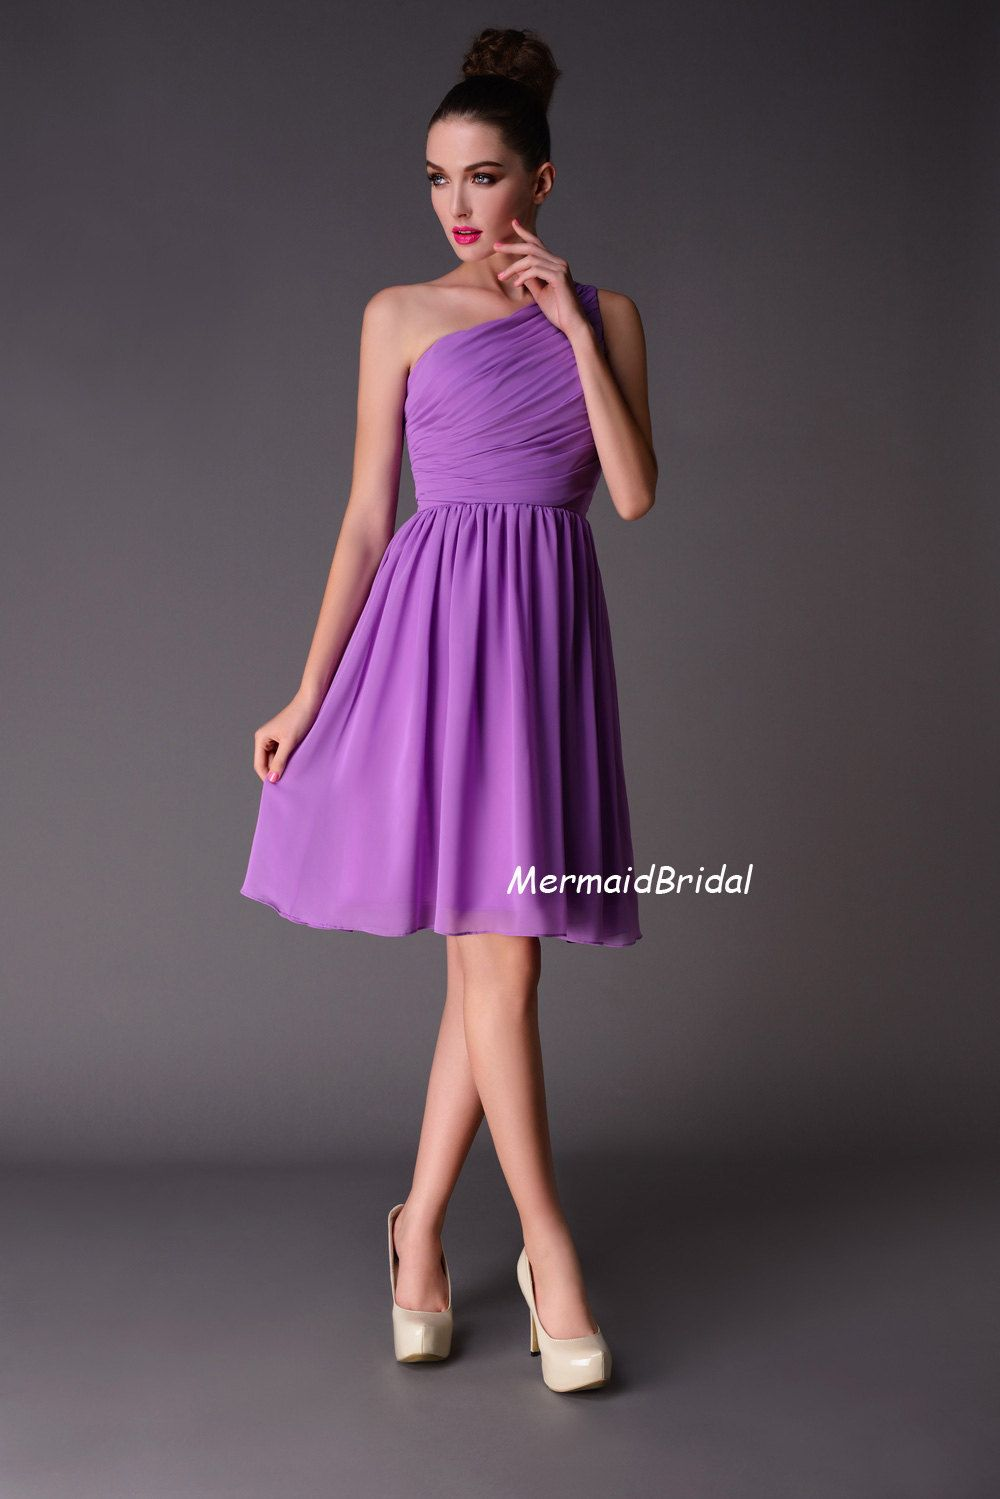 2013 A-line Knee length Lilac Bridesmaid Dress, Short bridesmaid ...